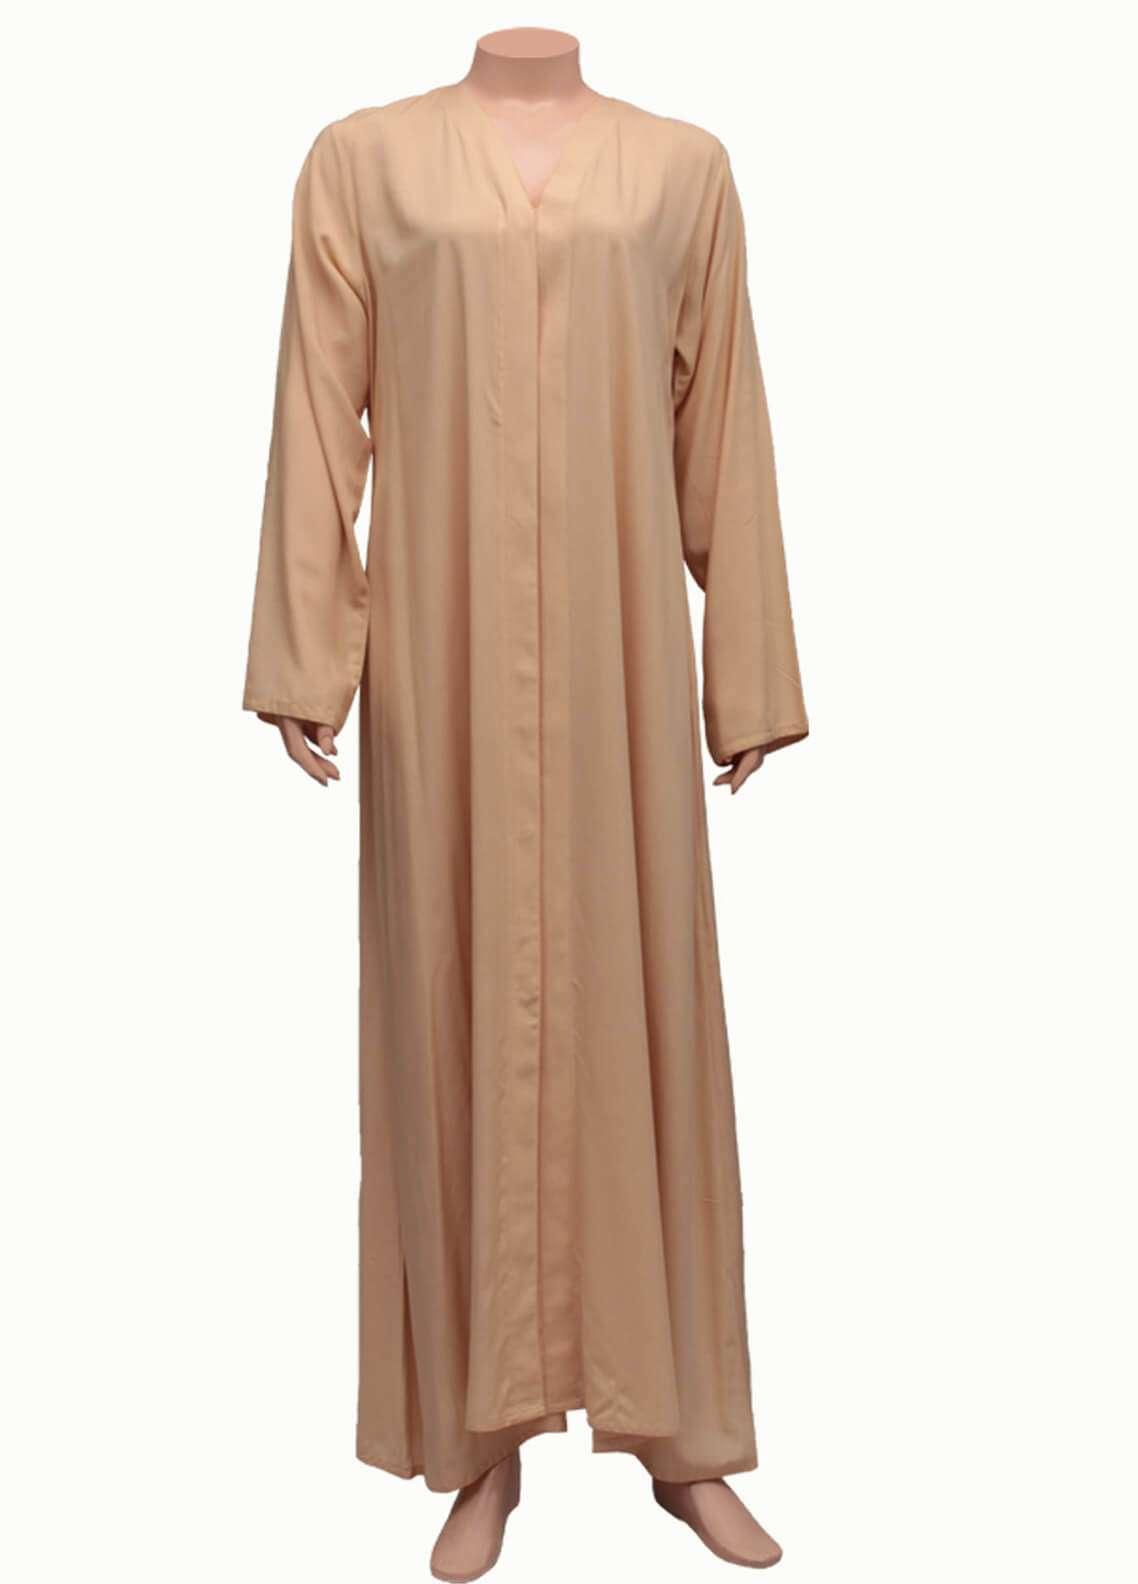 Hijab ul Hareem  Abayas New Stylish Designered Lawn Abaya 0116-P